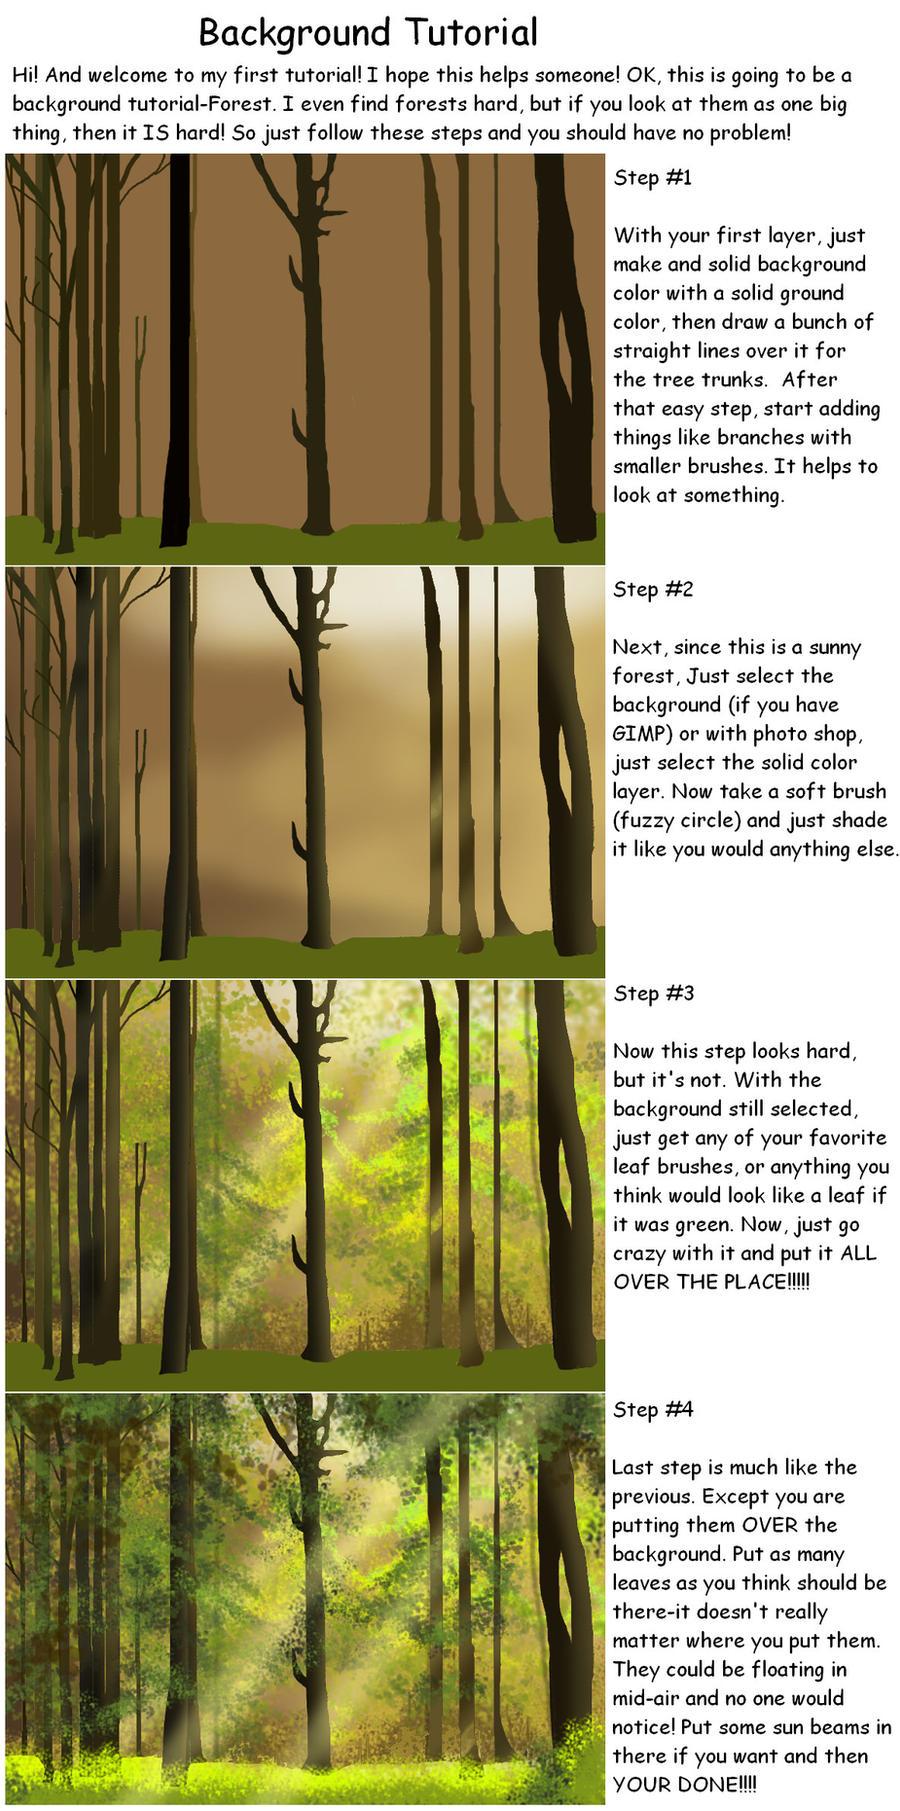 Background Tutorial by kokamo77 on DeviantArt